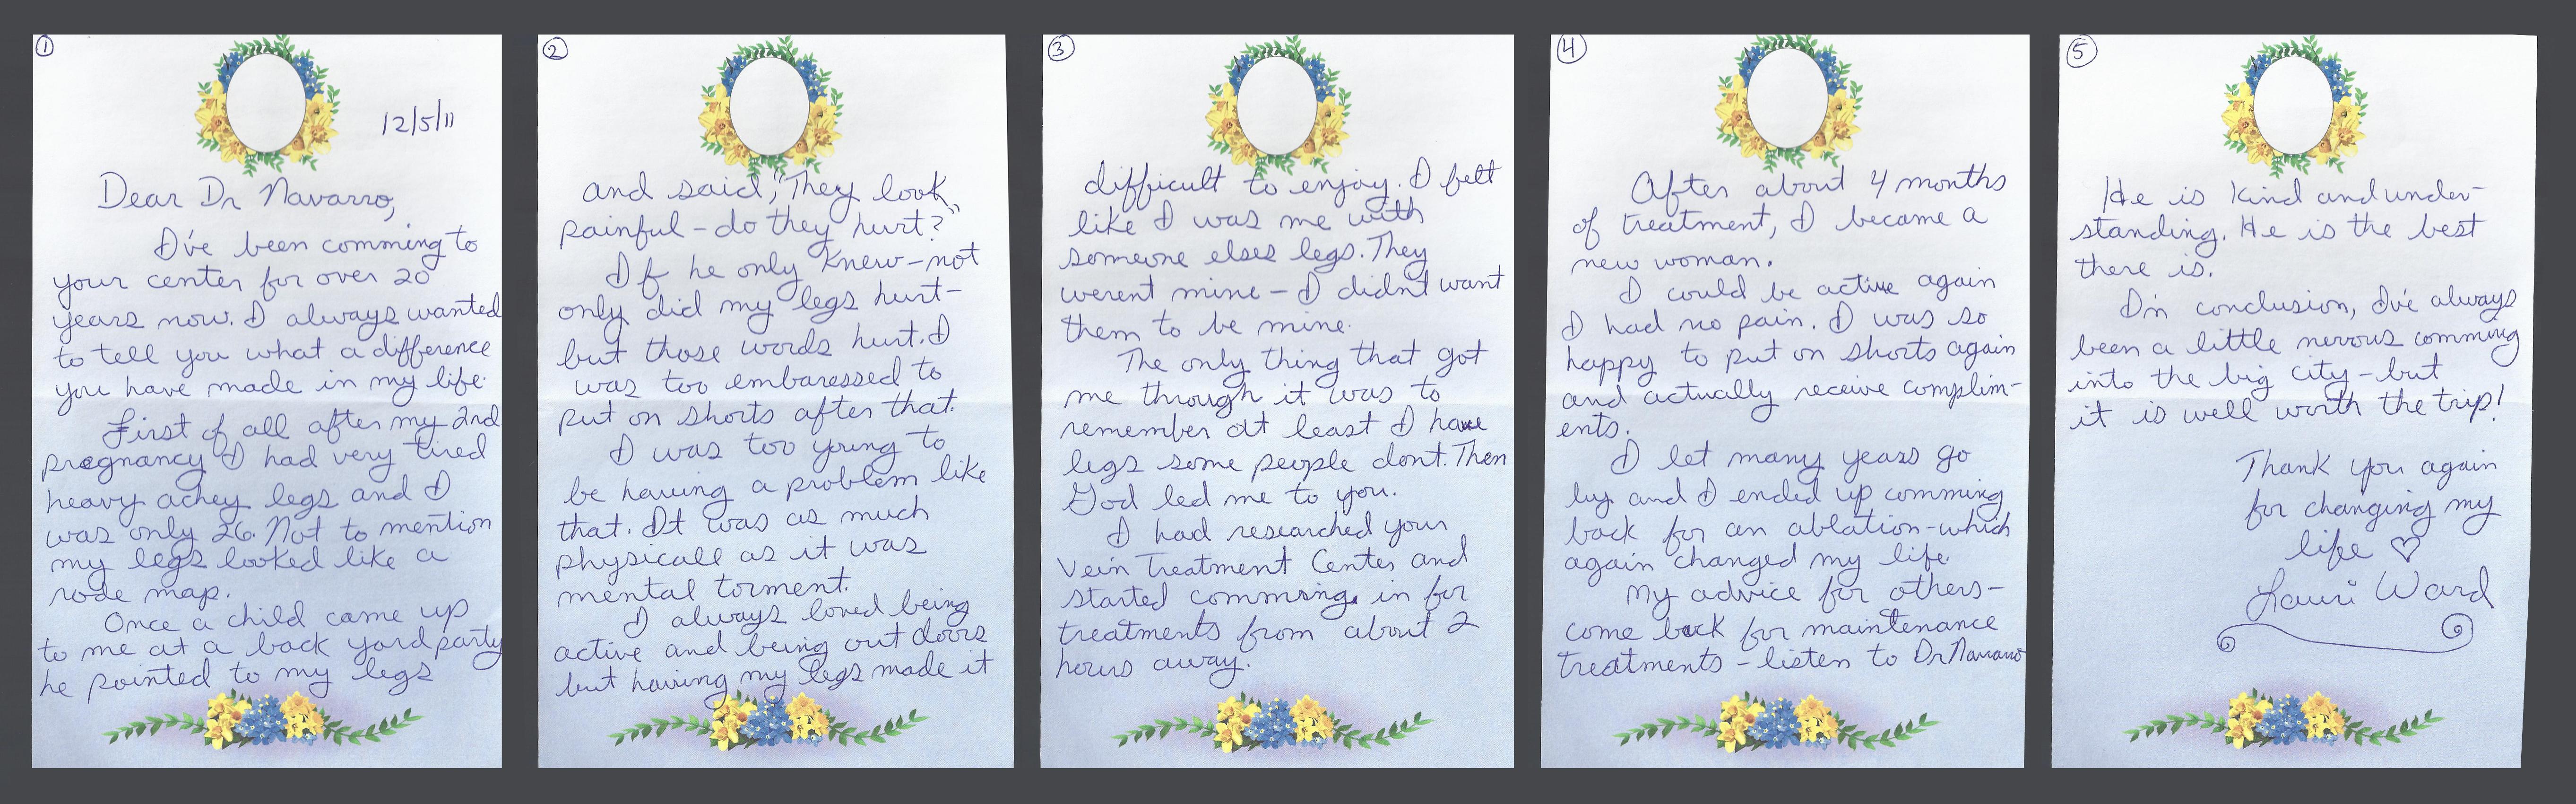 vein-treatment-center-nyc-patient-letter-testimonial-1